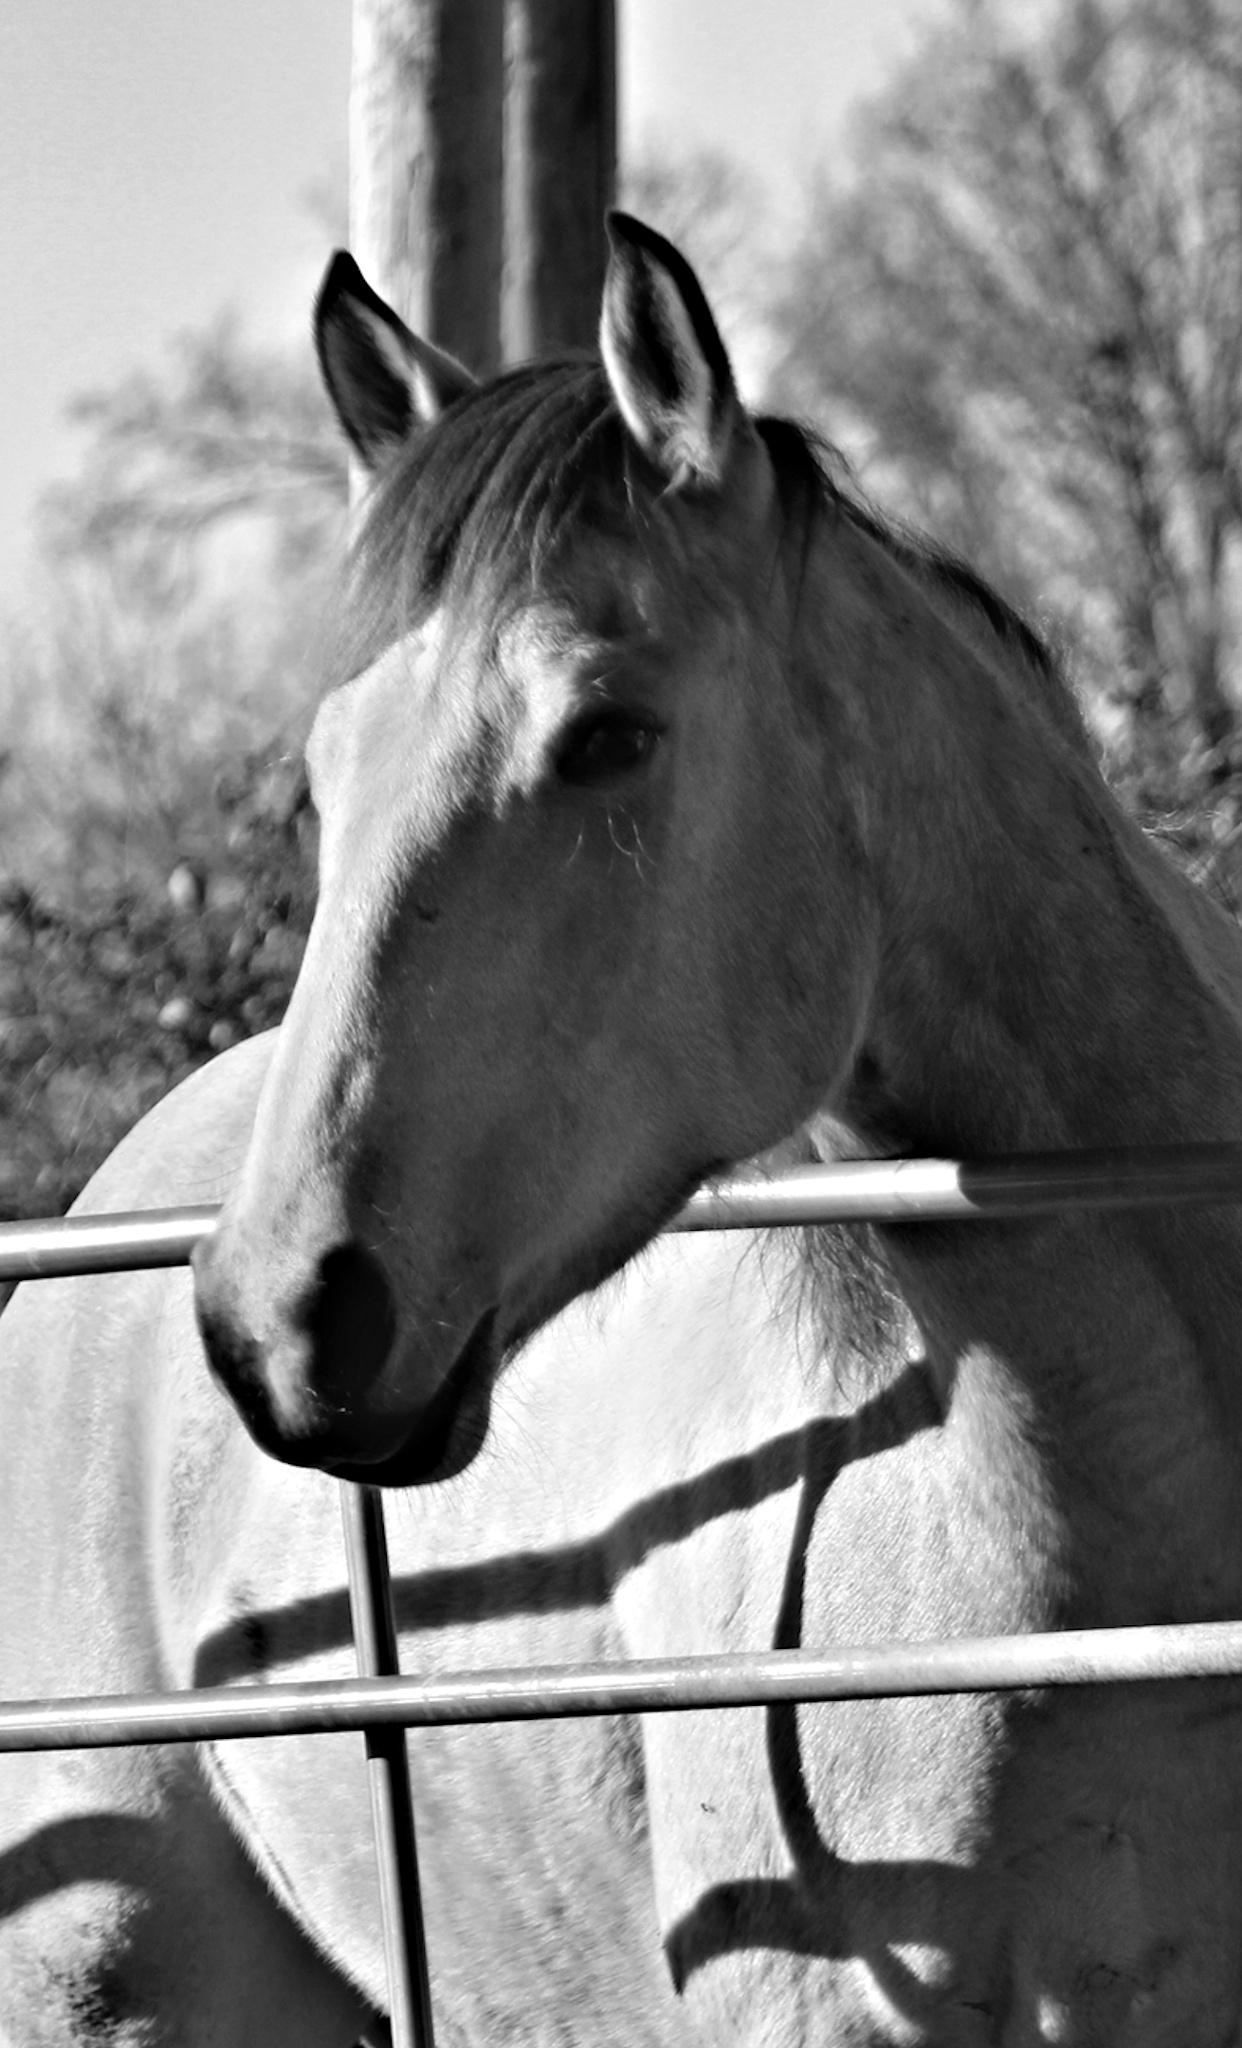 Horse in B&W by dubblybubbly51